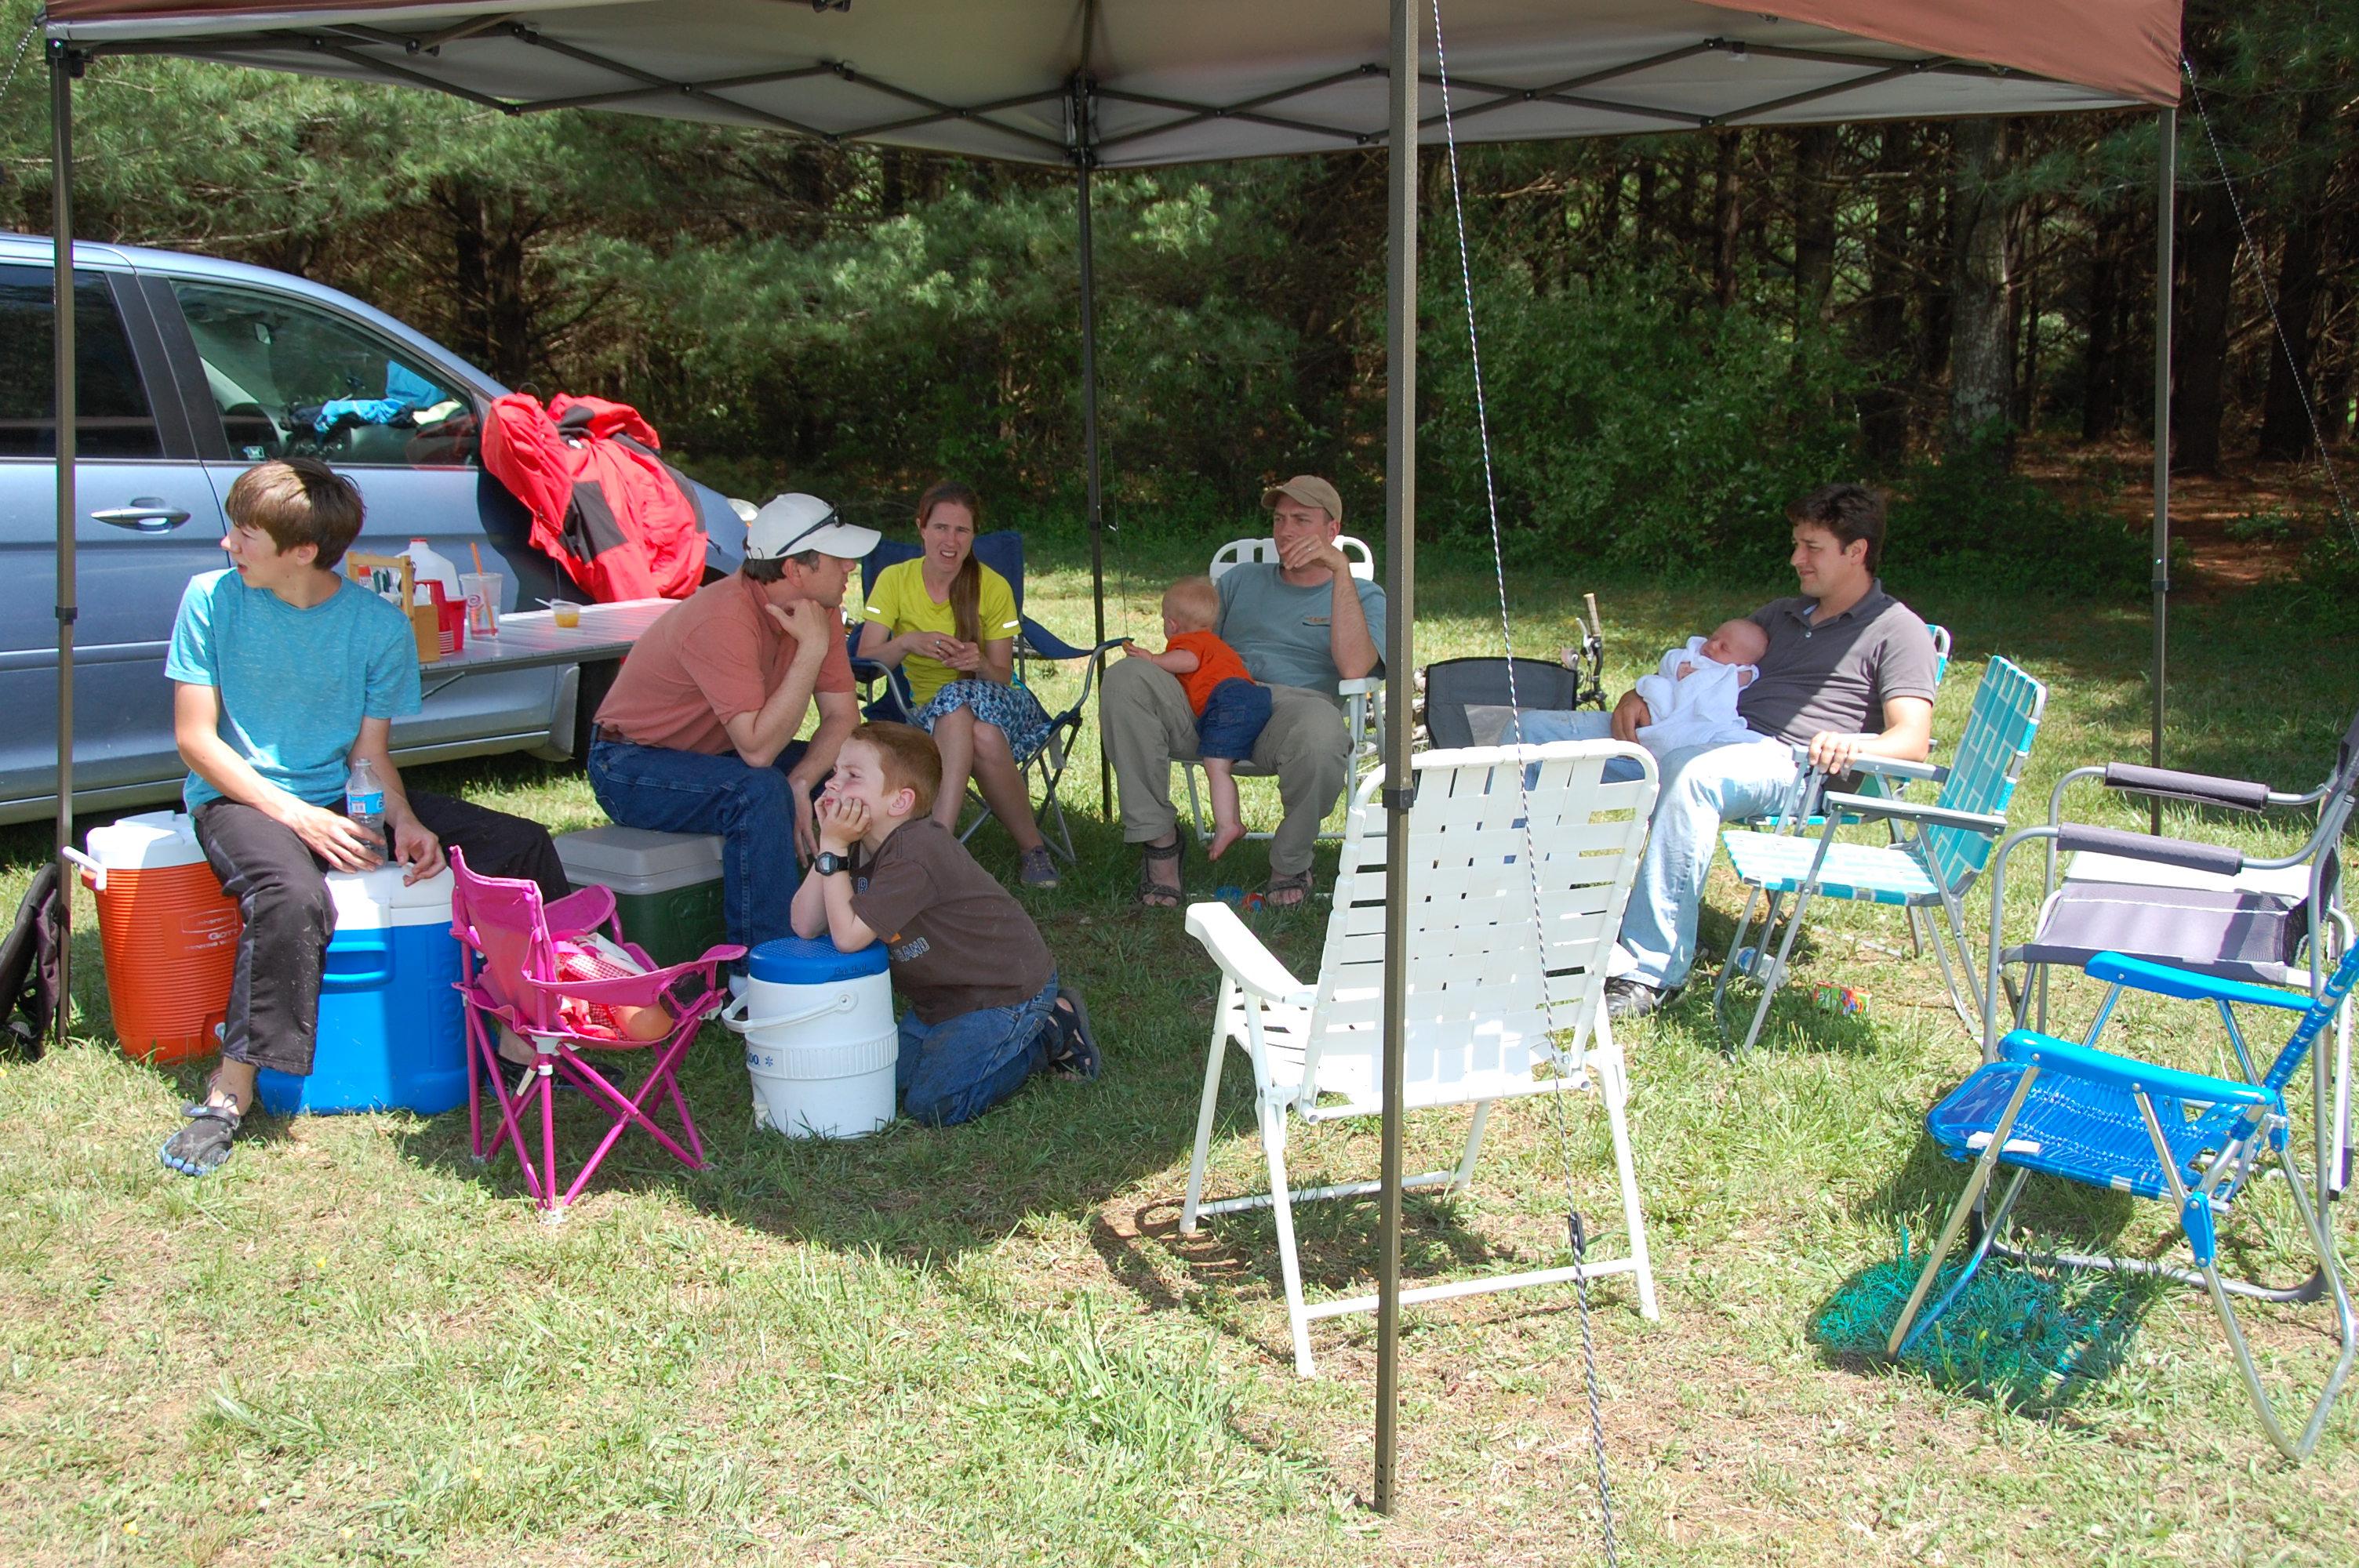 Enjoying some shade under our canopy. (Tucker, Ned, & Sarah Loyd, Cooper, Kolby & Chester, Finley & Ian Dunavant)